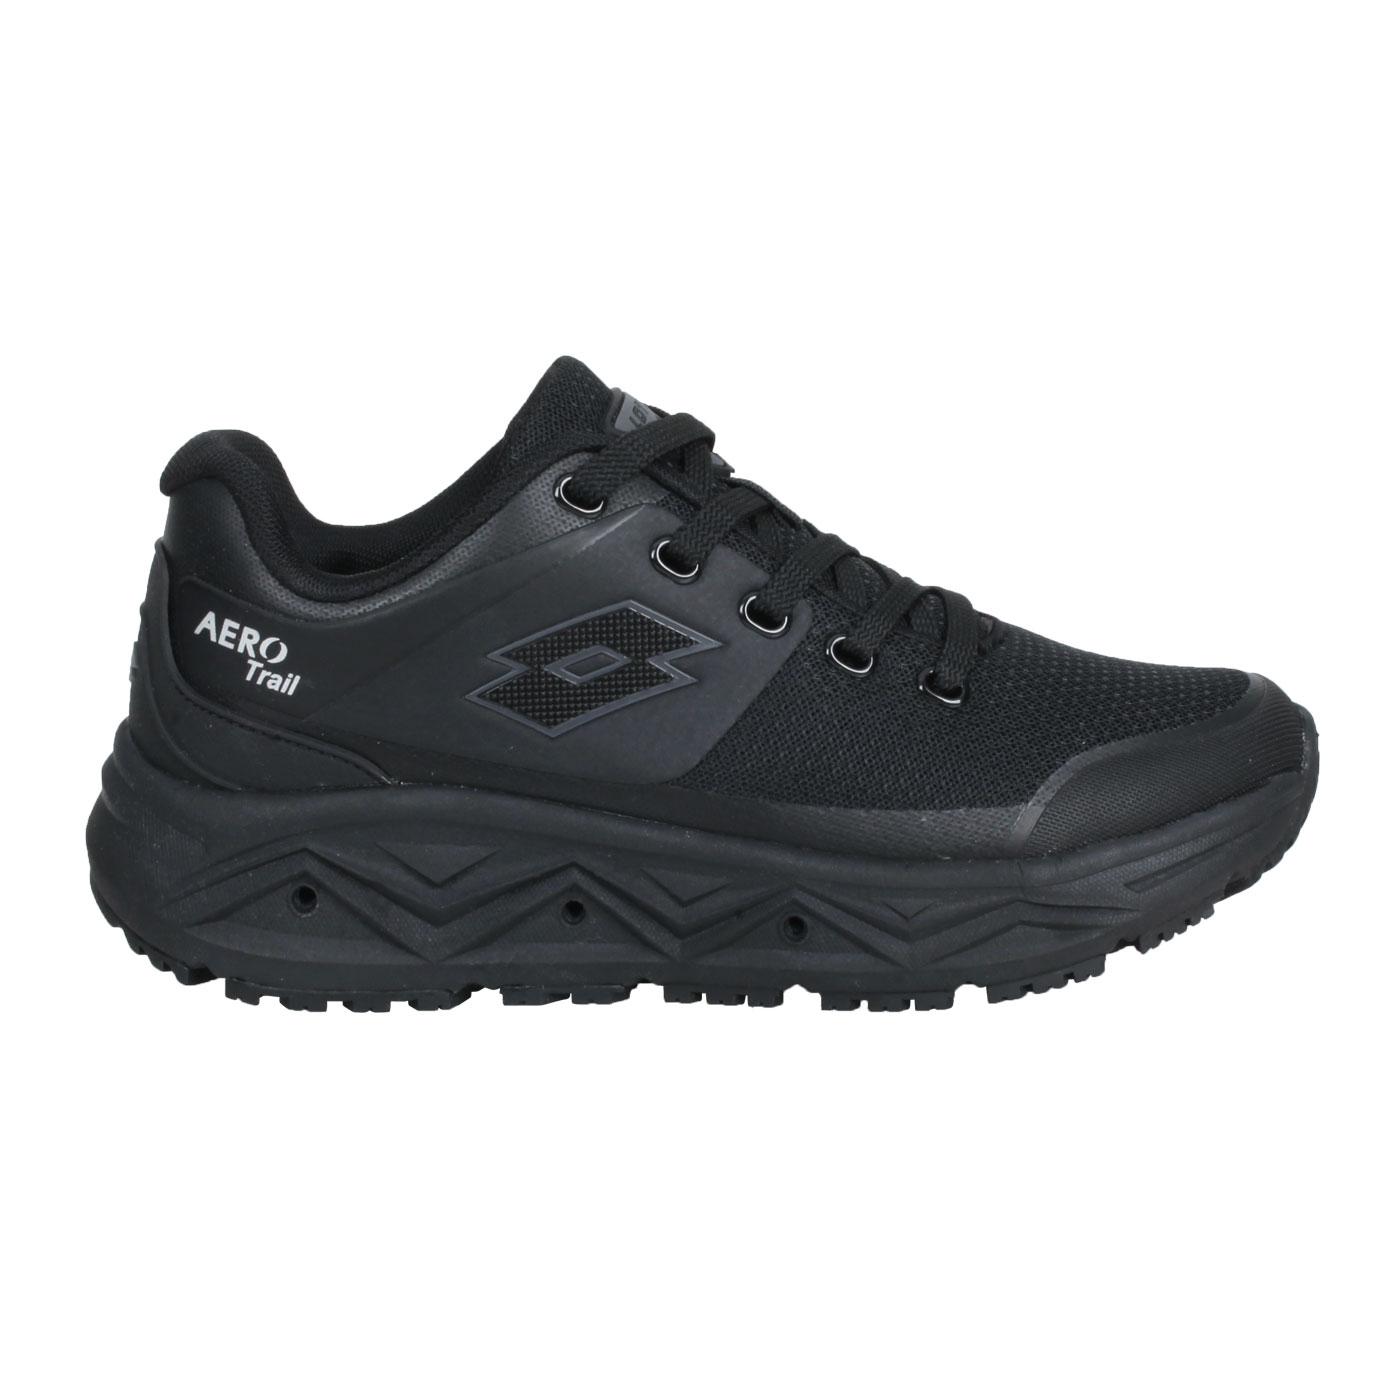 LOTTO 女款透氣越野跑鞋 LT1AWR3780 - 黑白